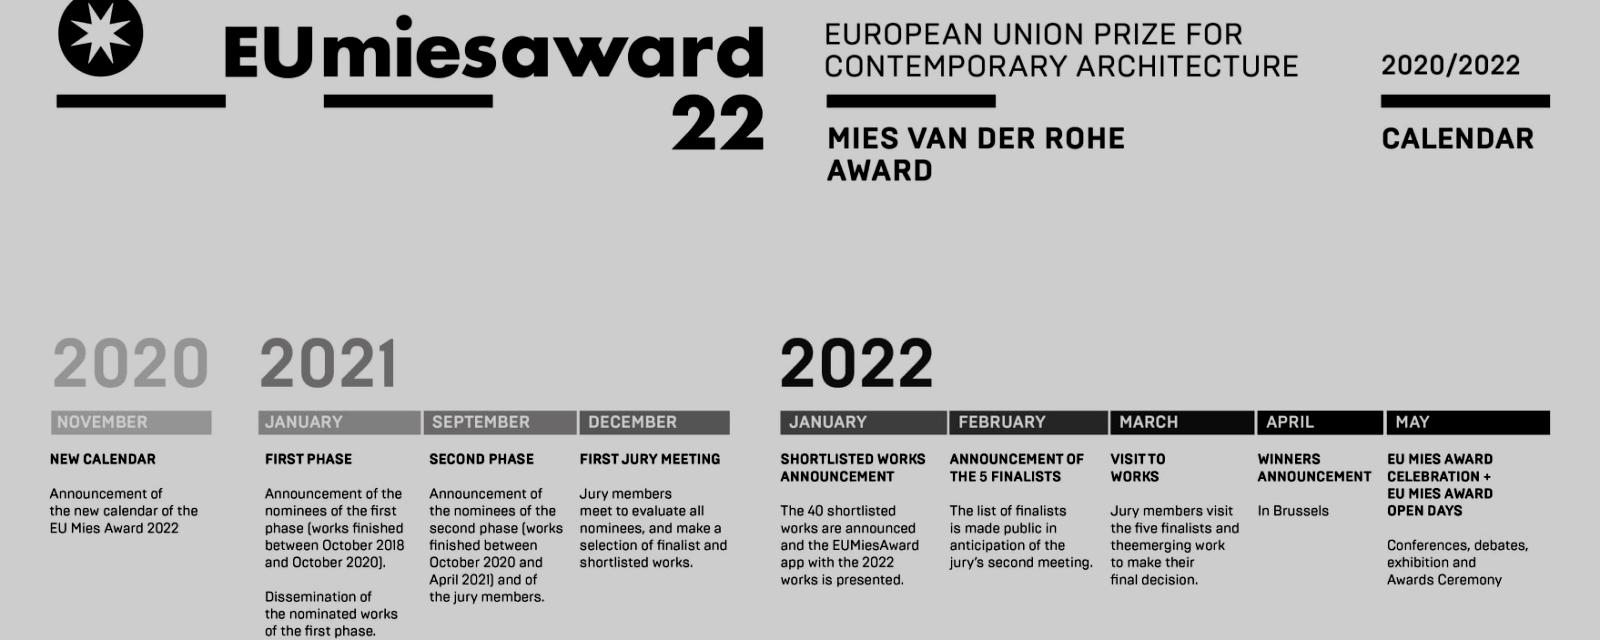 eumiesaward-22